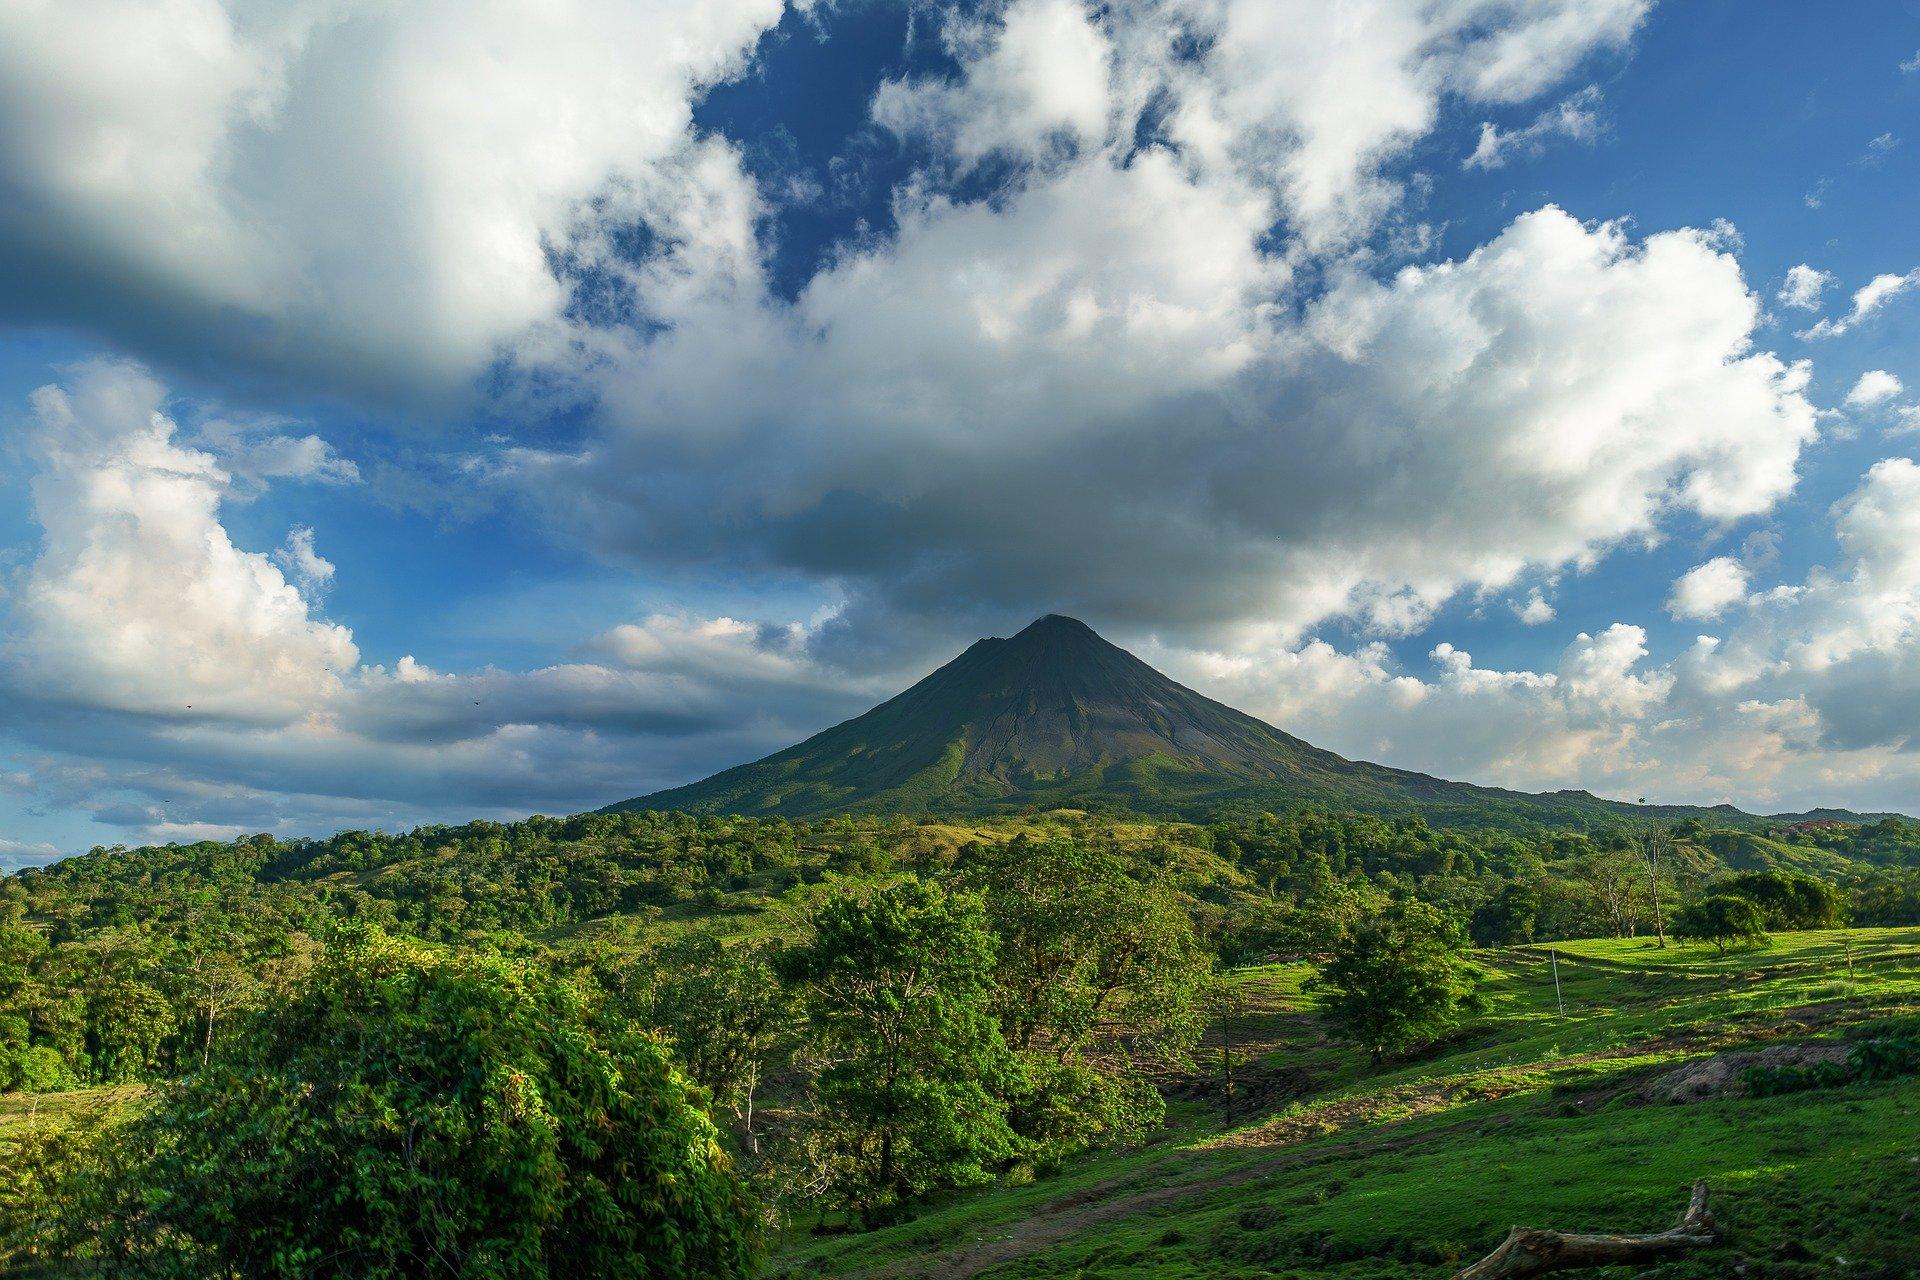 Best Costa Rican attractions, Arenal Volcano in San Carlos, Costa Rica